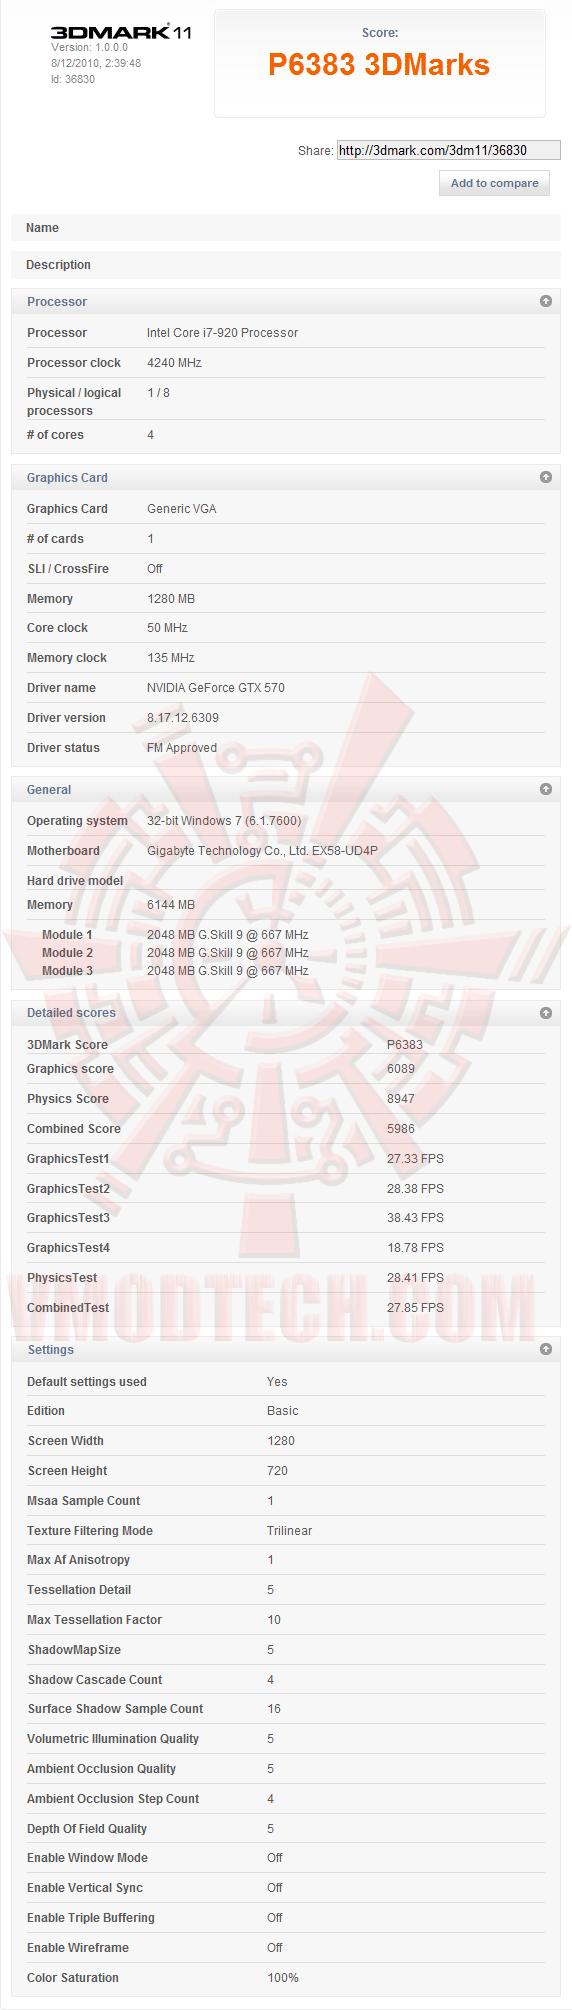 11 ov NVIDIA GeForce GTX 570 1280MB GDDR5 Debut Review